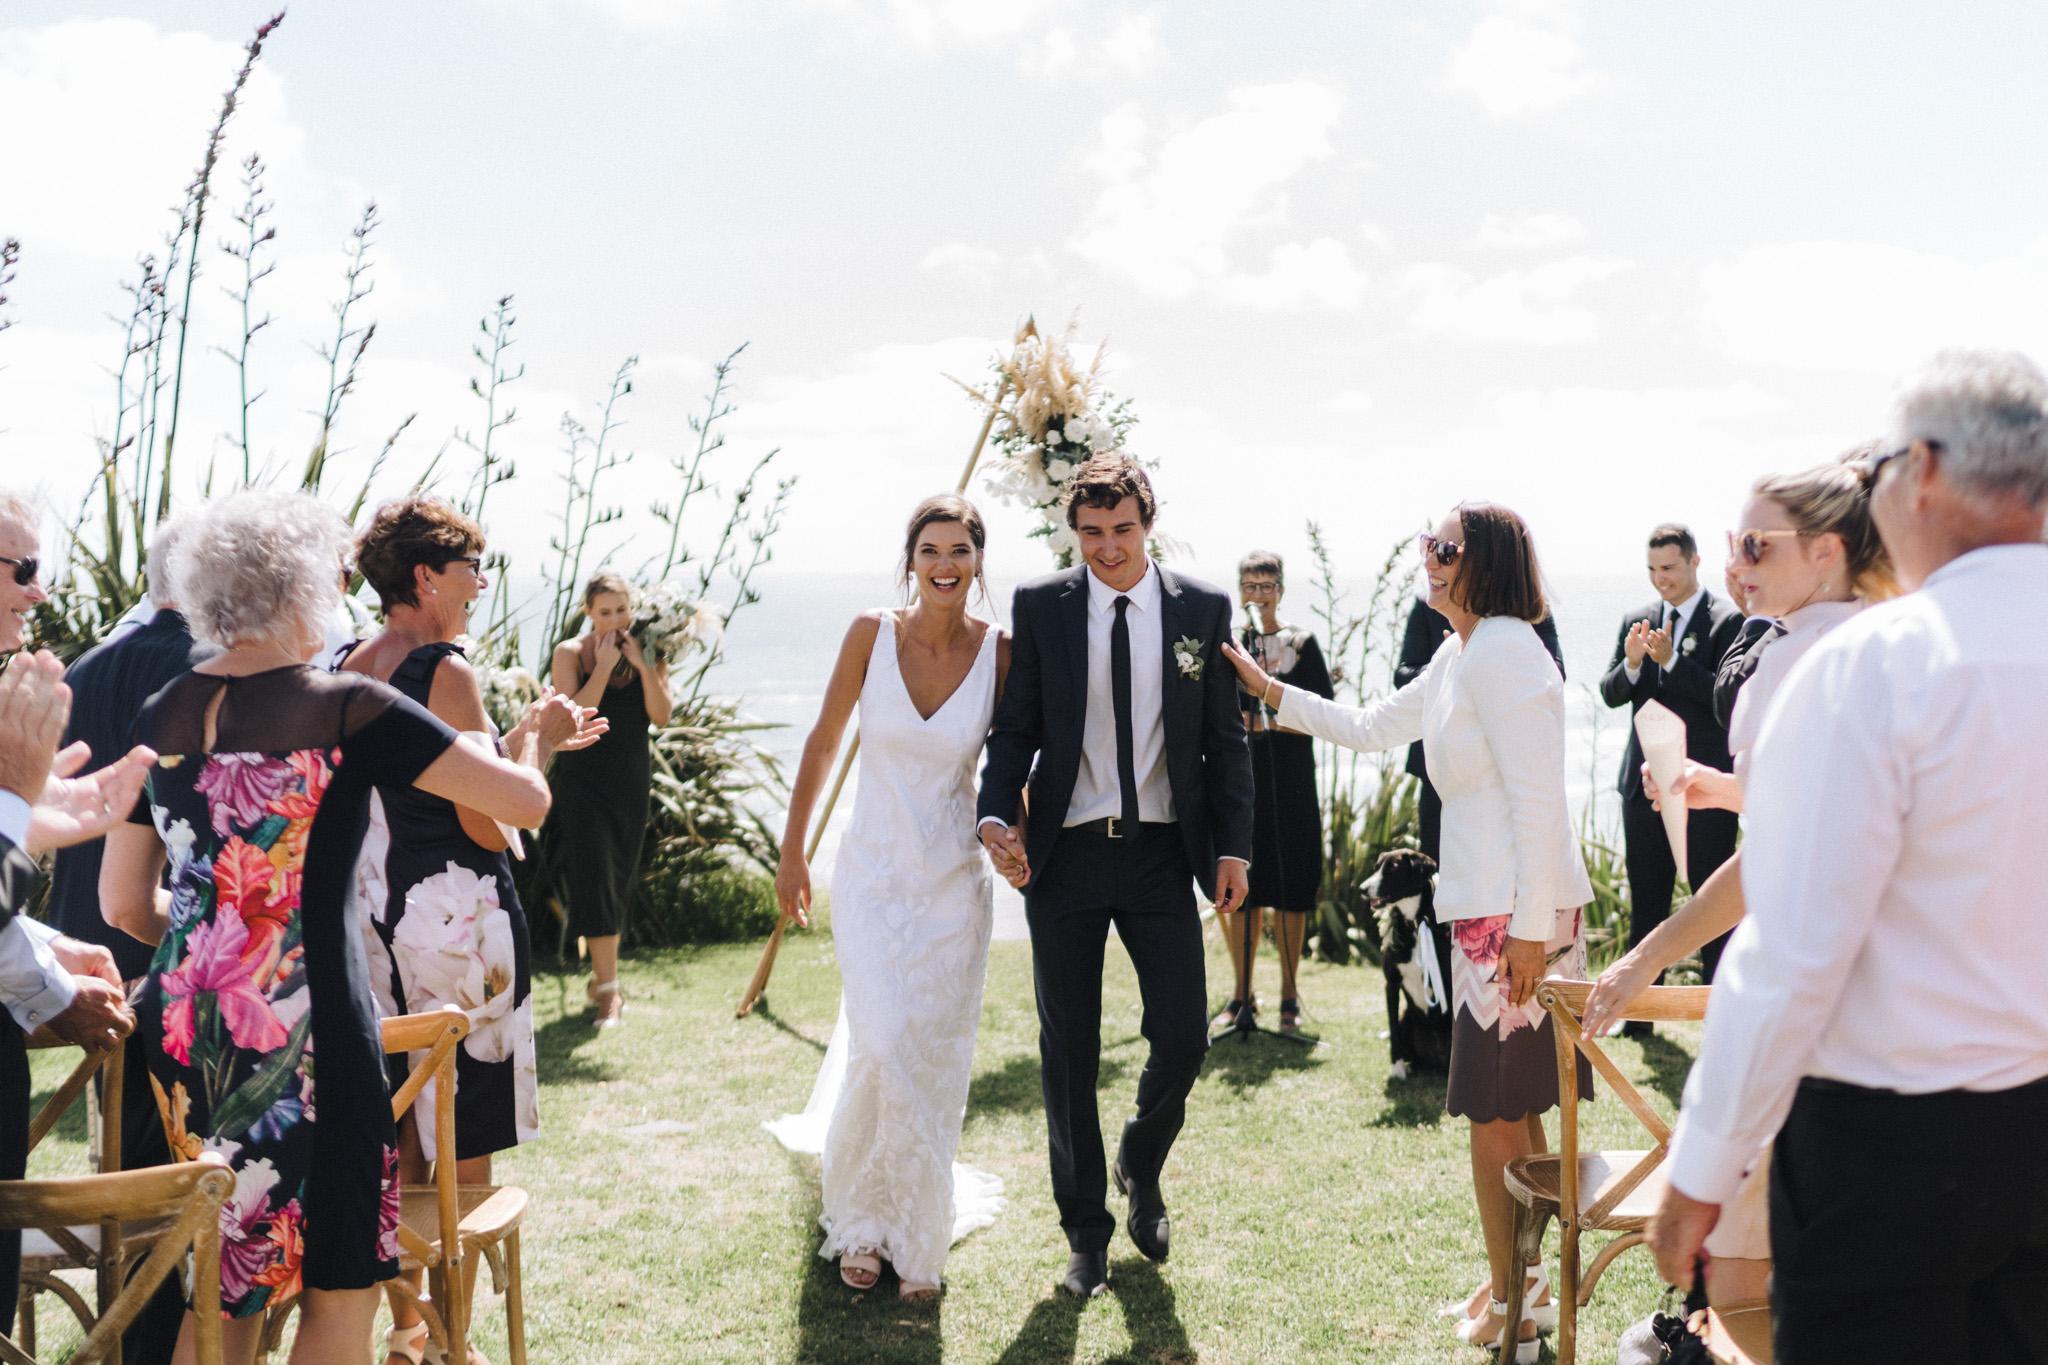 newfound-h-m-castaways-waiuku-auckland-wedding-photographer-127